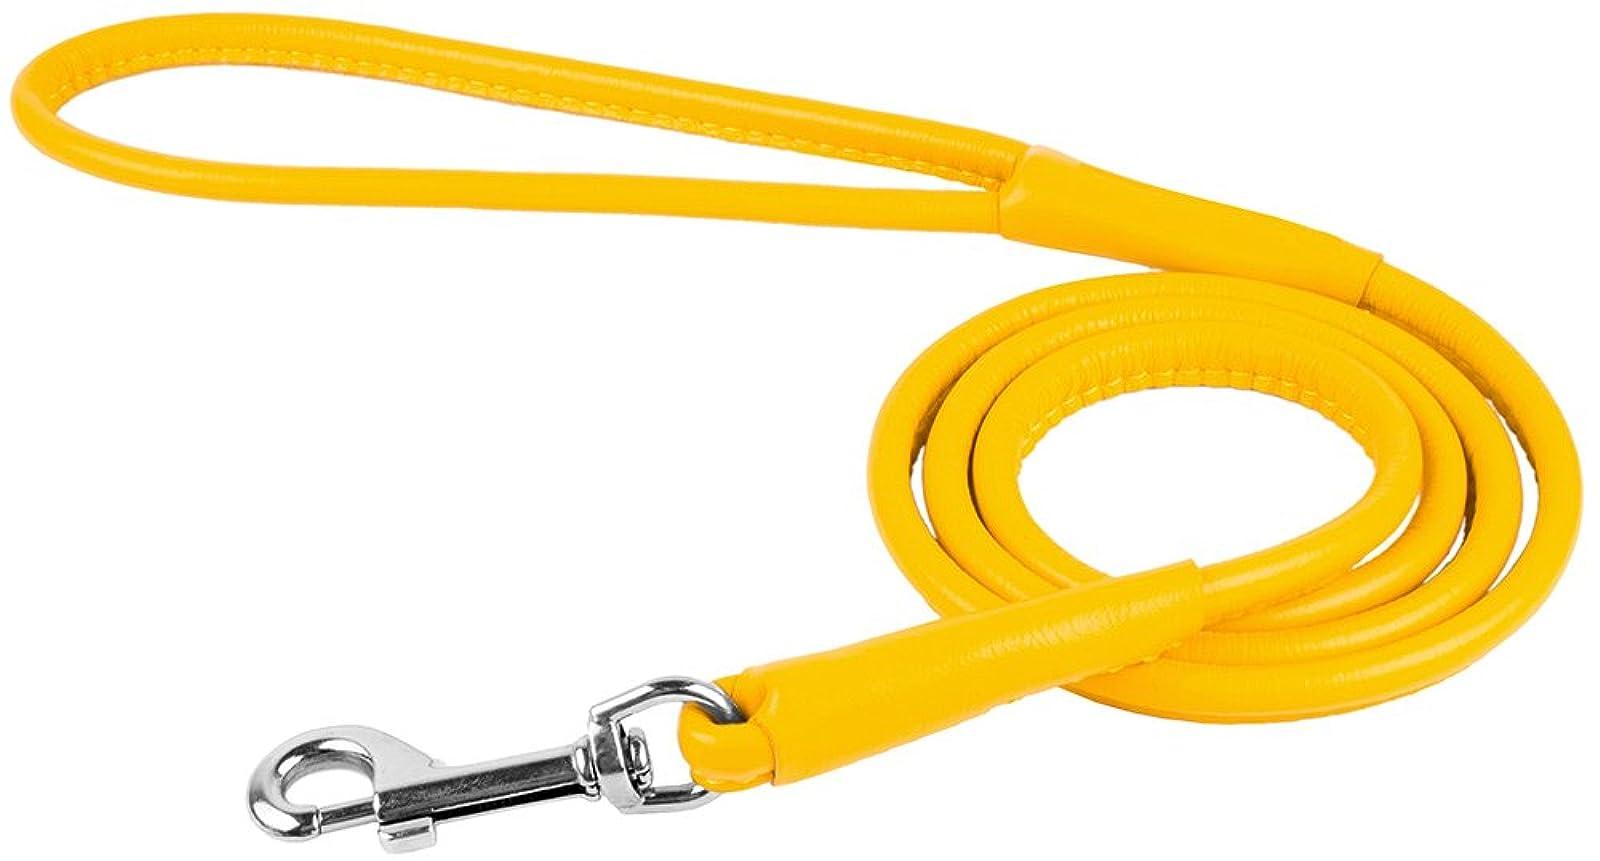 CollarDirect Rolled Leather Dog Leash 4ft Soft - 8